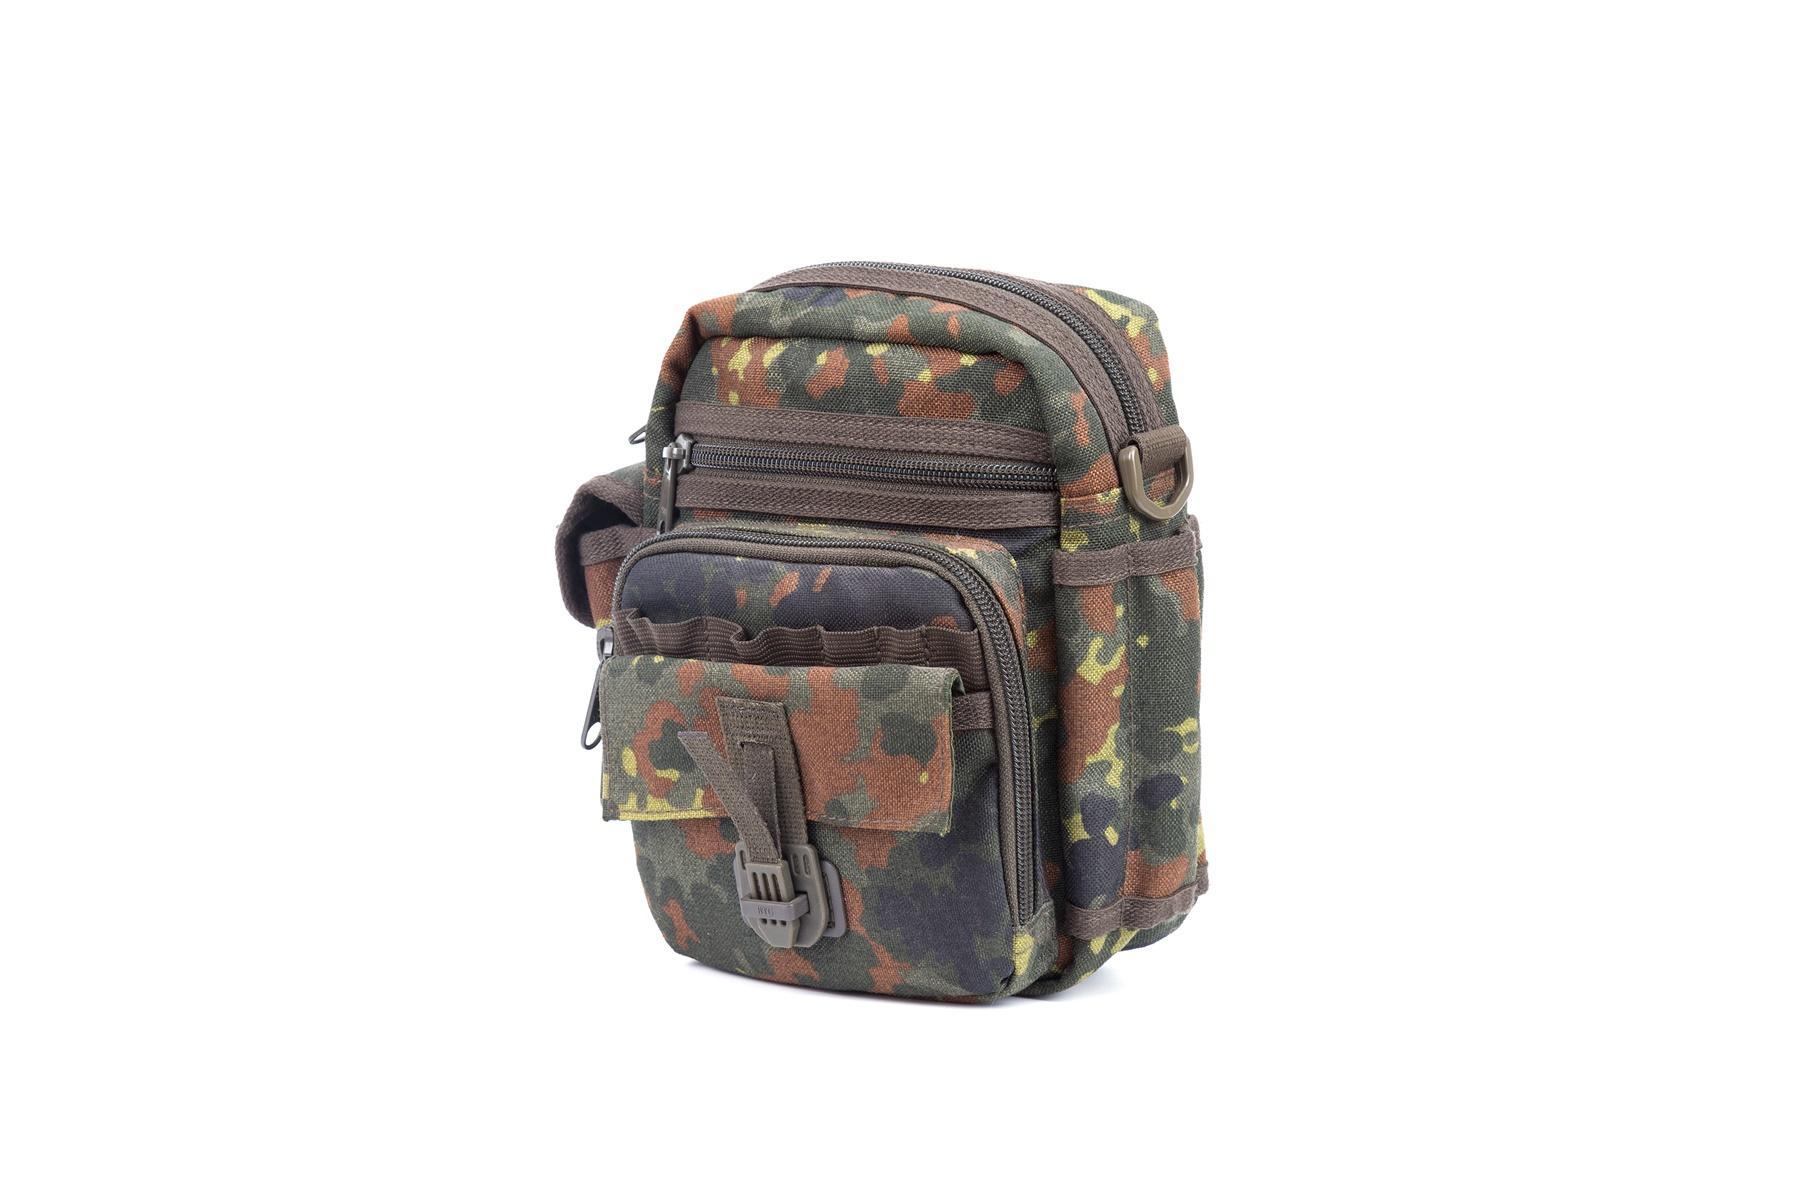 Military Crossbody Bag Nylon fabric zipper closure